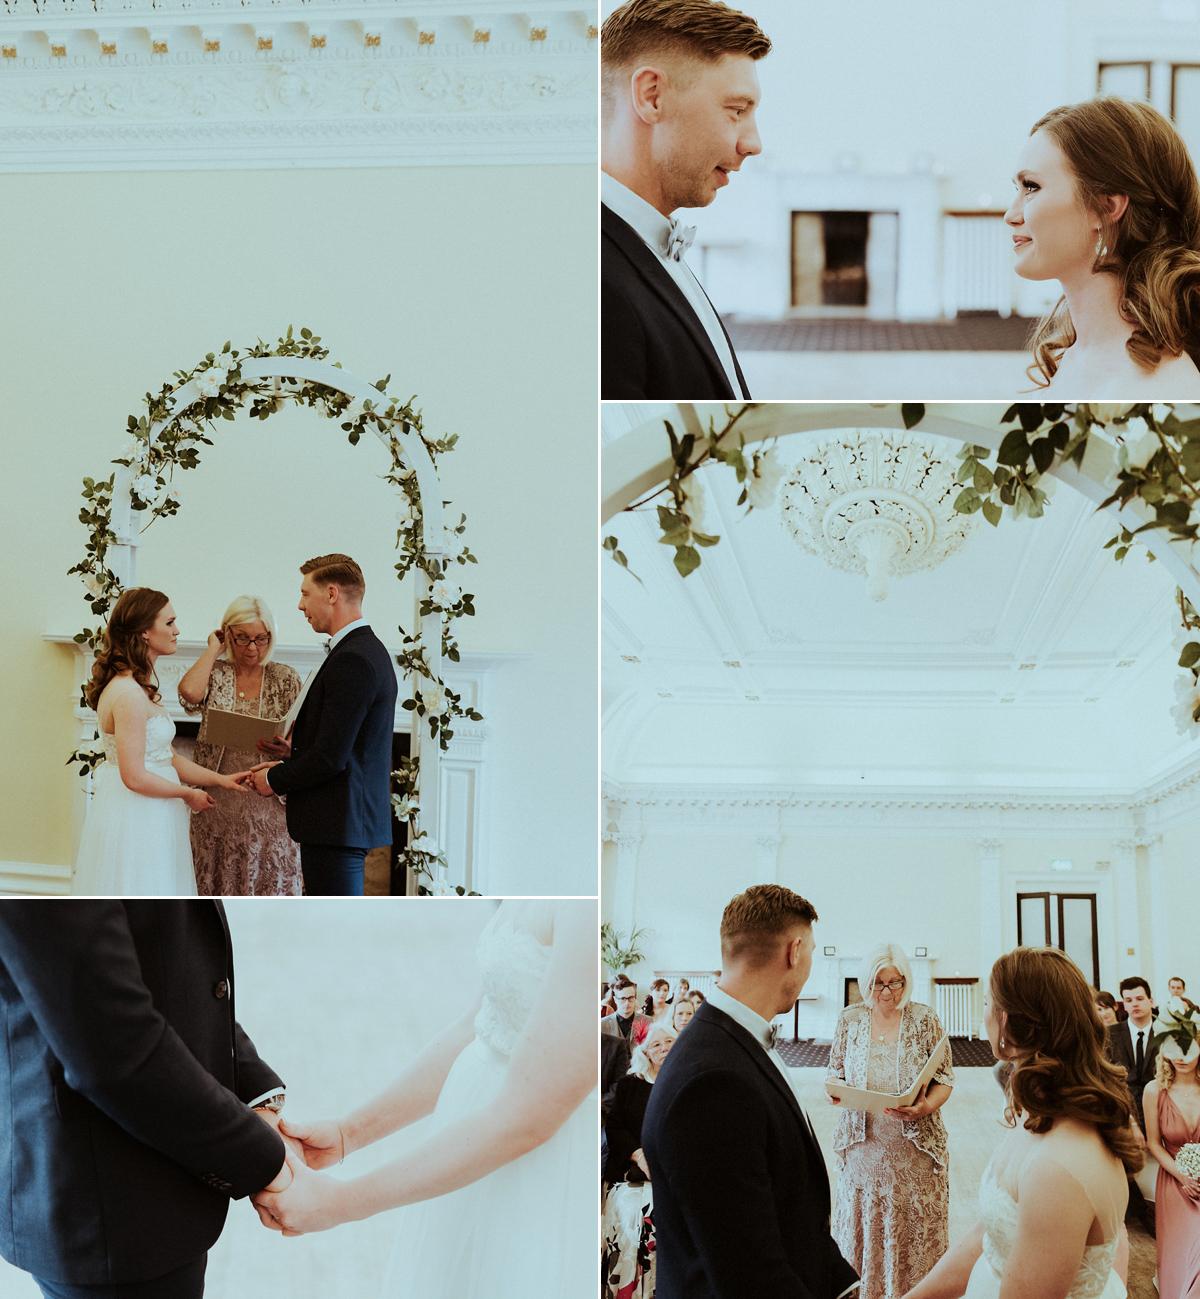 Great Wedding Dress Hire Leeds Images - Wedding Ideas - memiocall.com